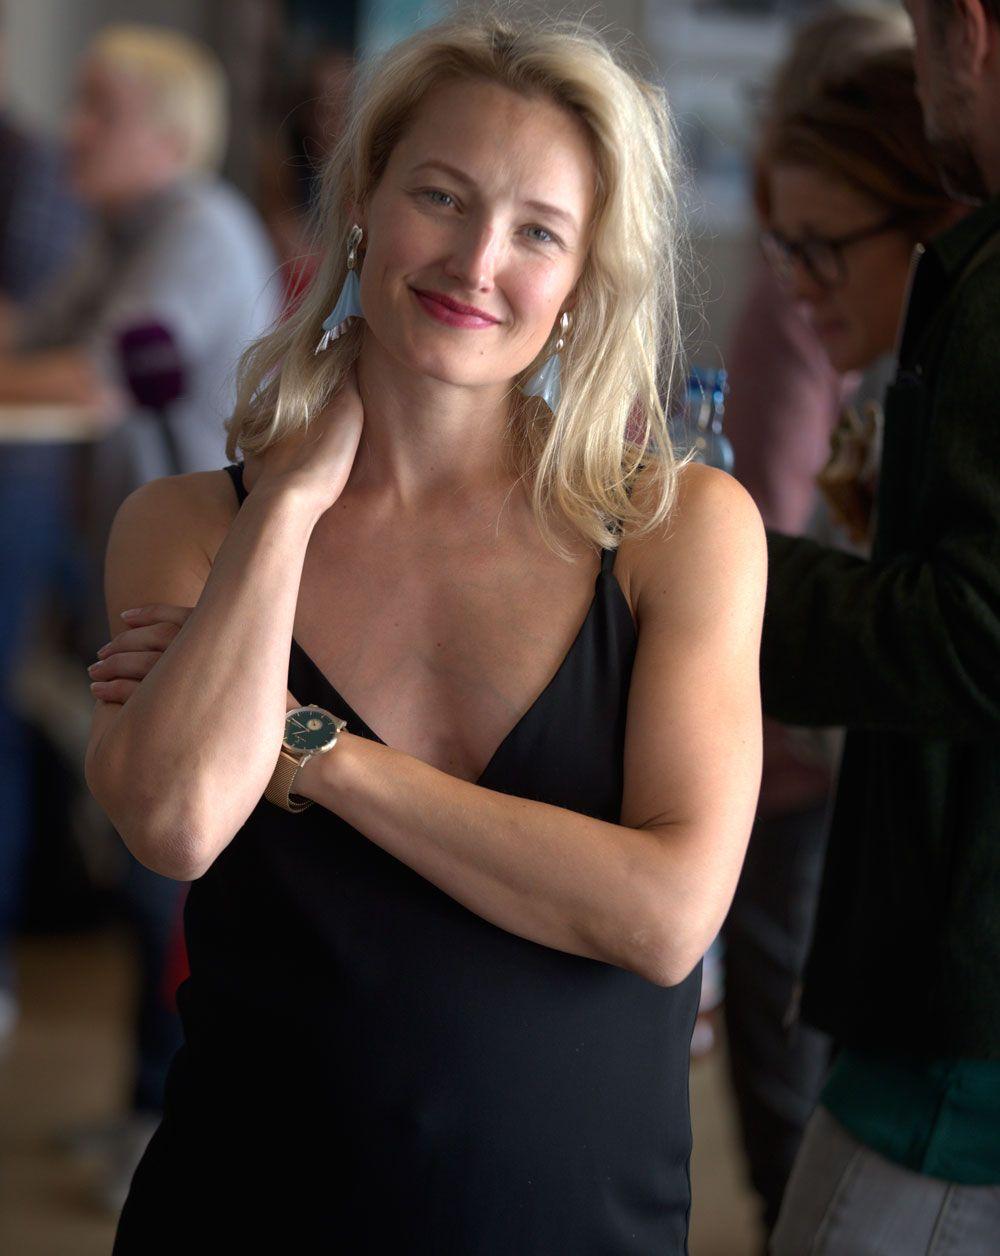 PRISBELØNT: Ine Marie Wilmann er blant Norges største stjerneskudd.